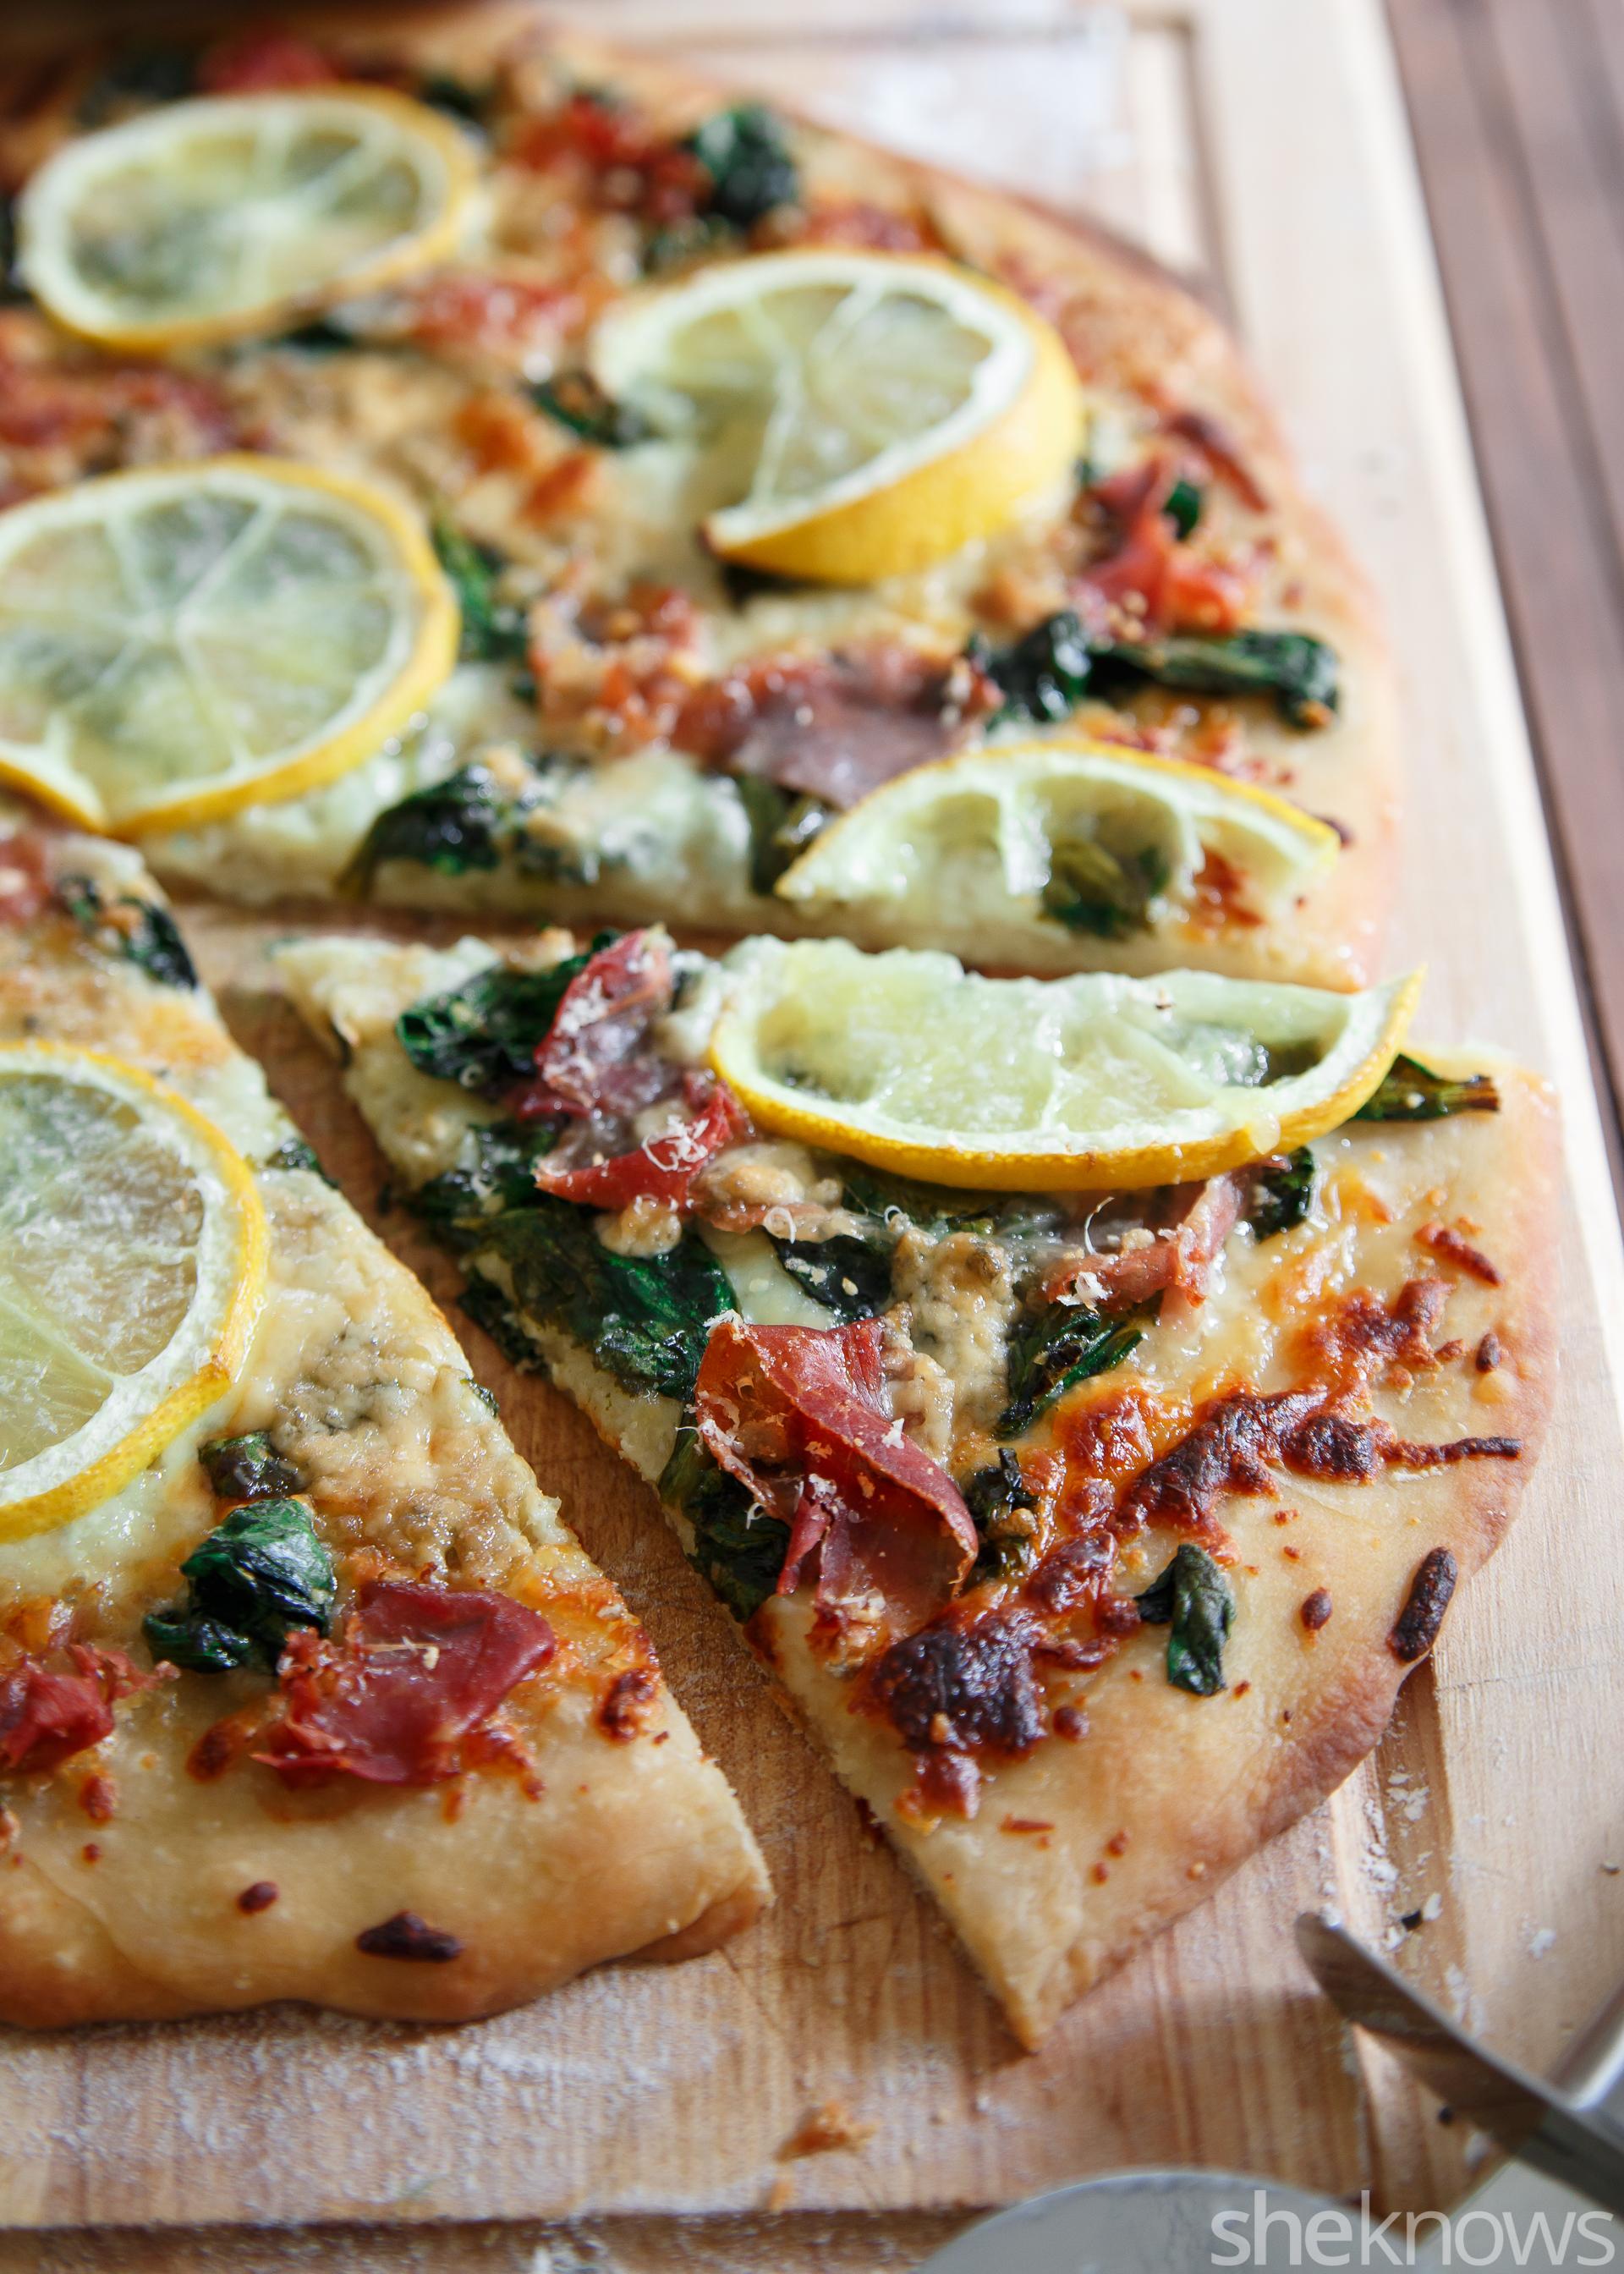 Meyer lemon prosciutto pizza